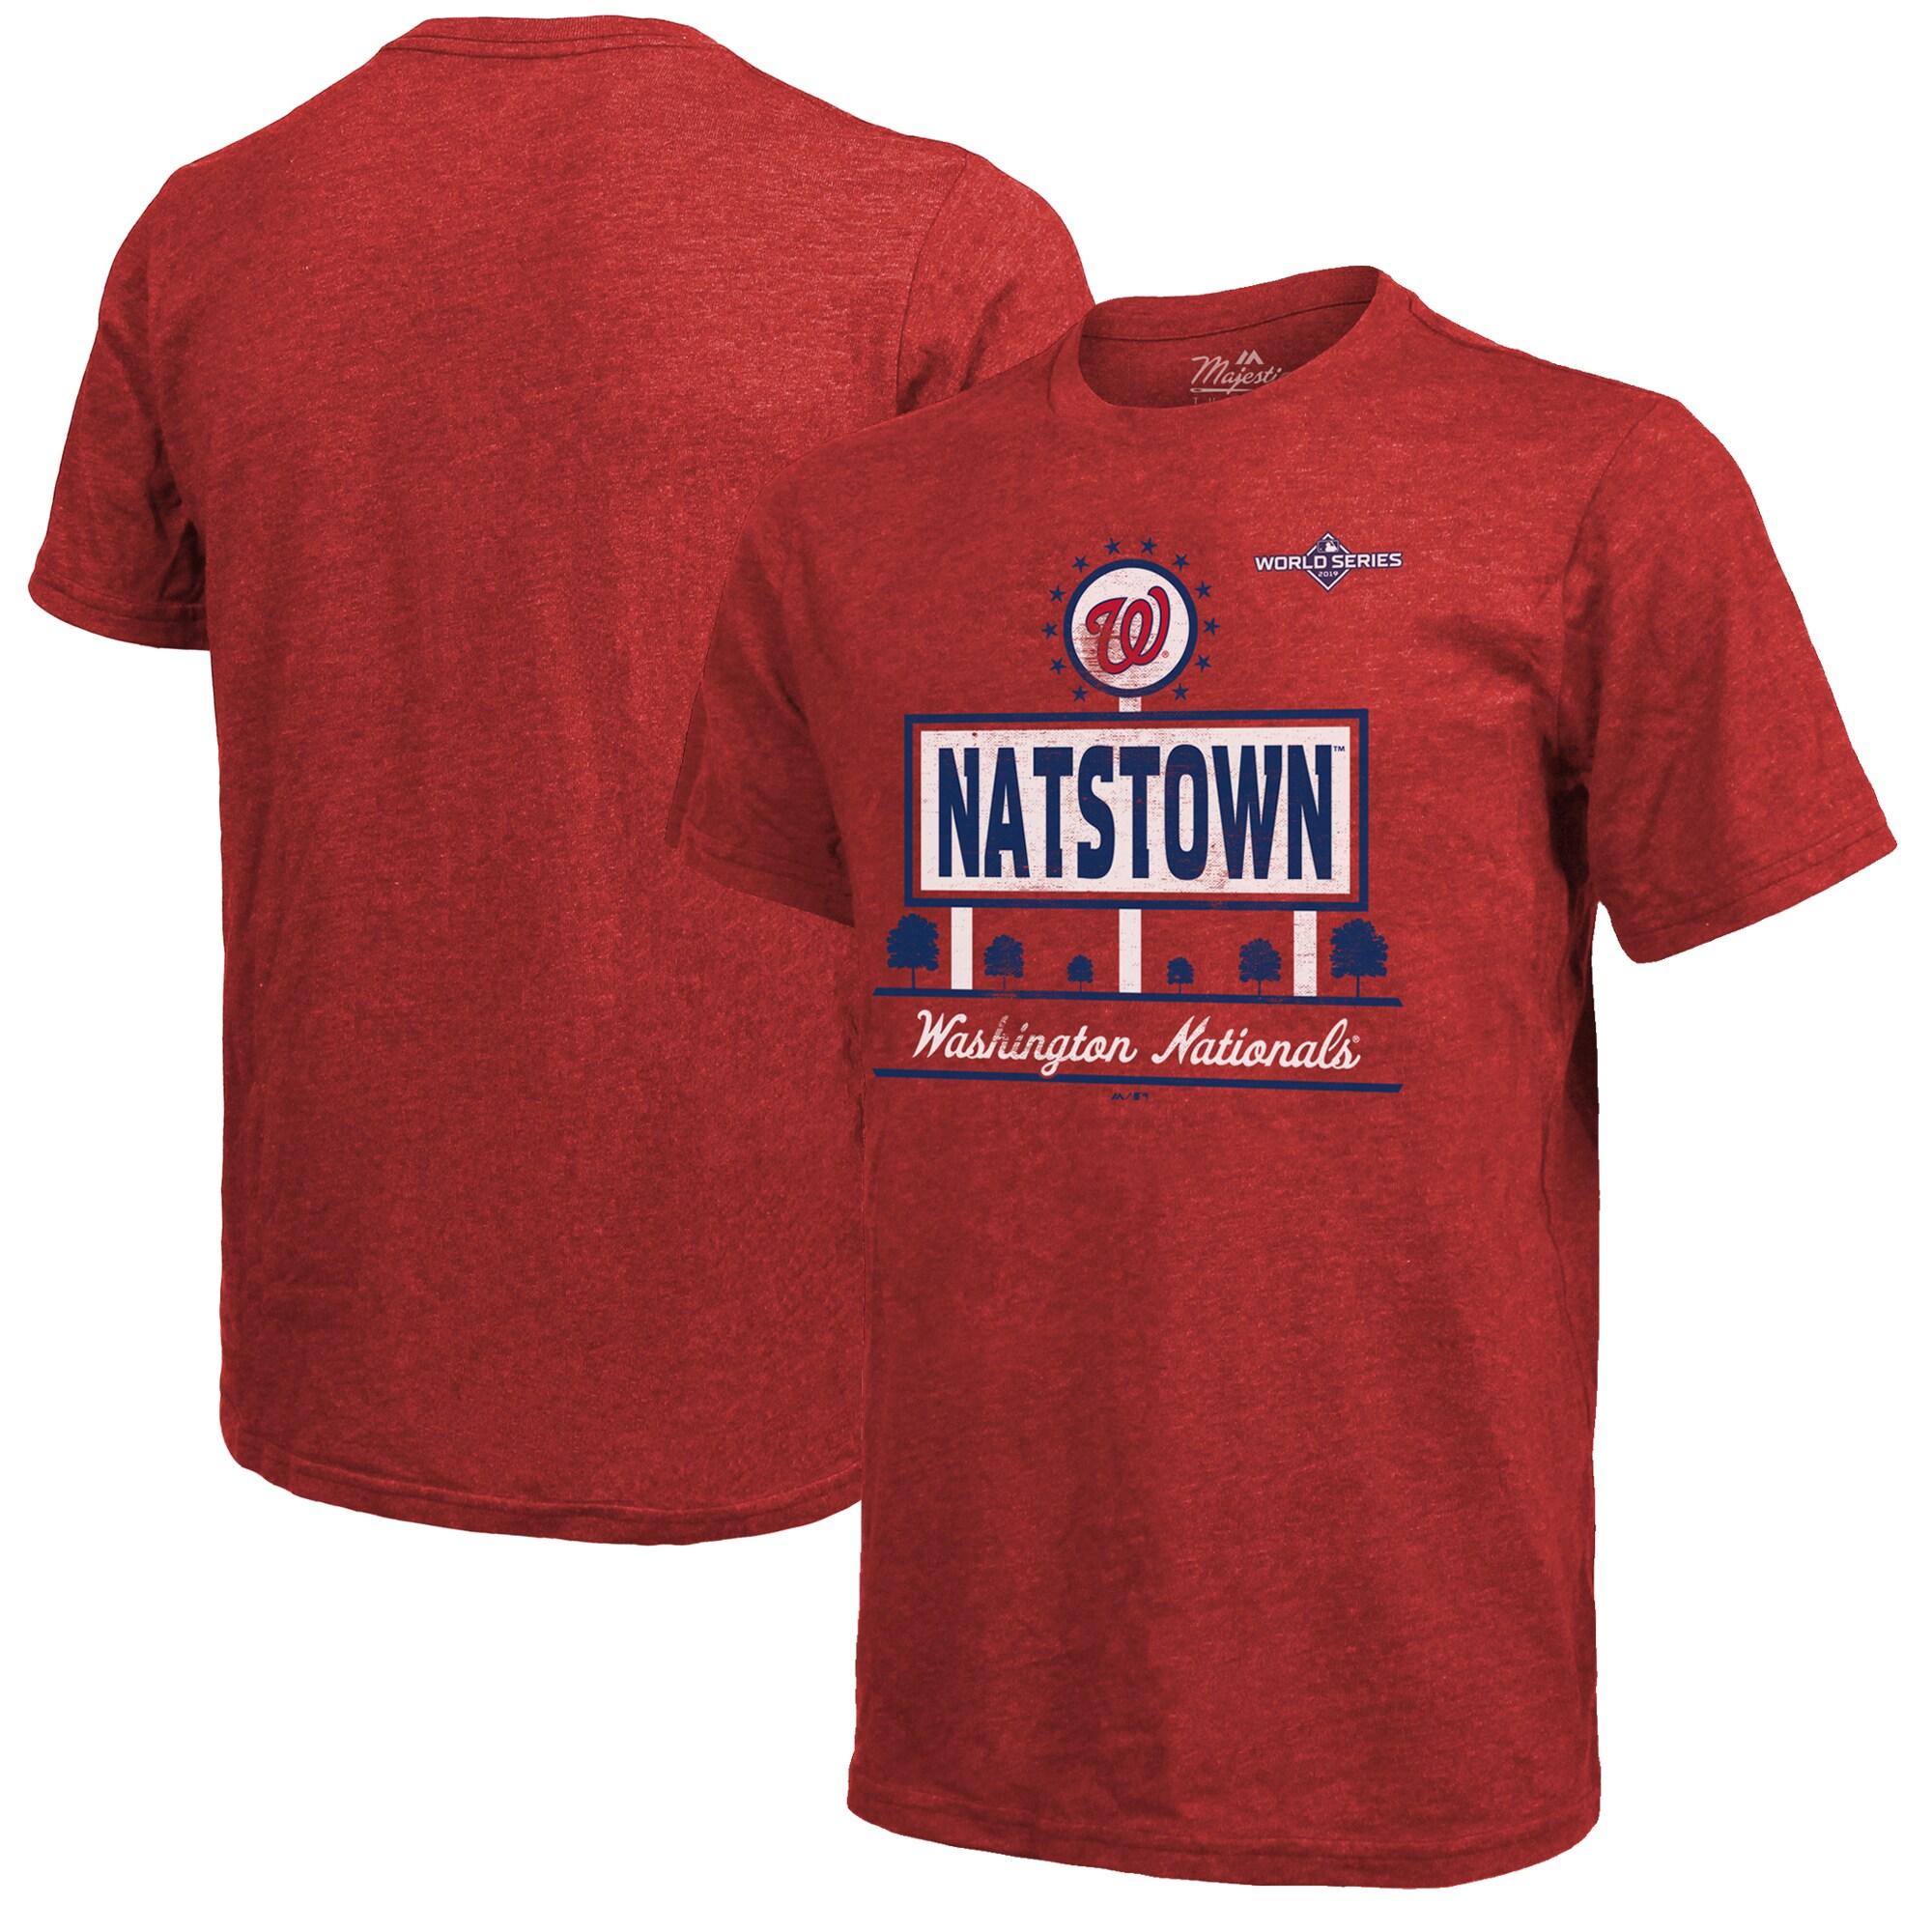 Washington Nationals Majestic Threads 2019 World Series Bound Hometown T-Shirt - Red